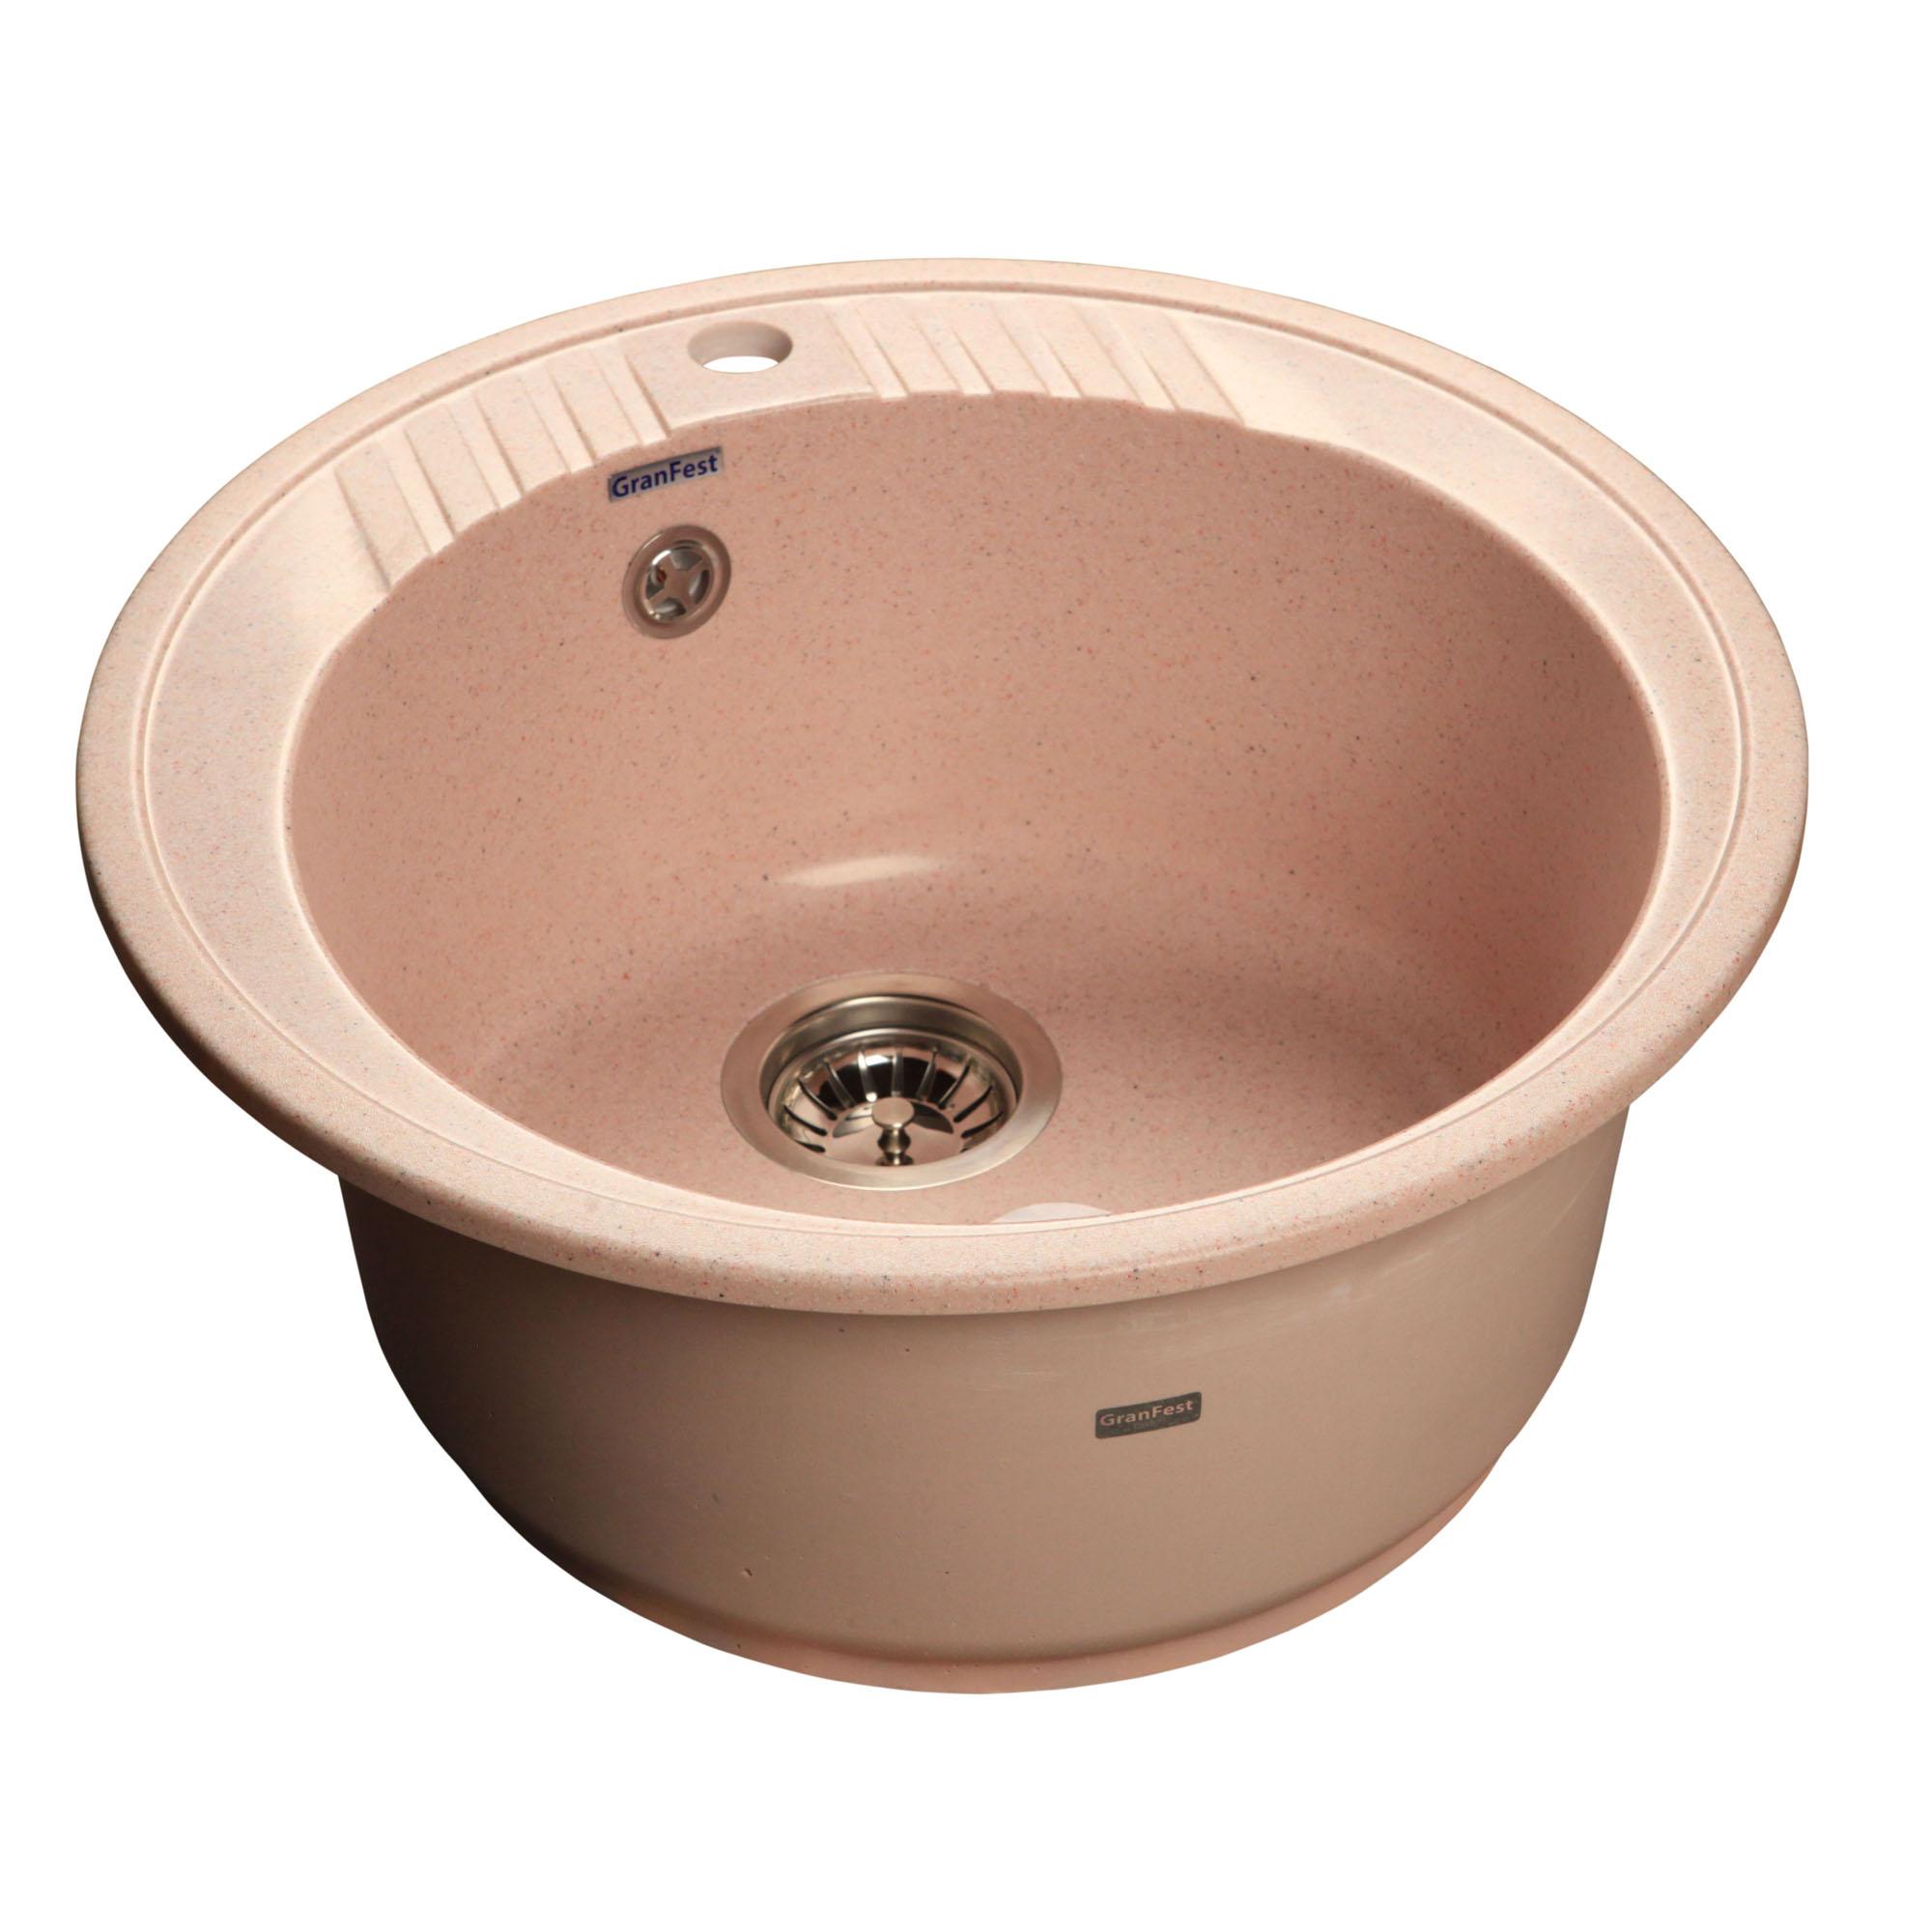 Кухонная мойка GranFest Rondo GF-R520 светло-розовый цена